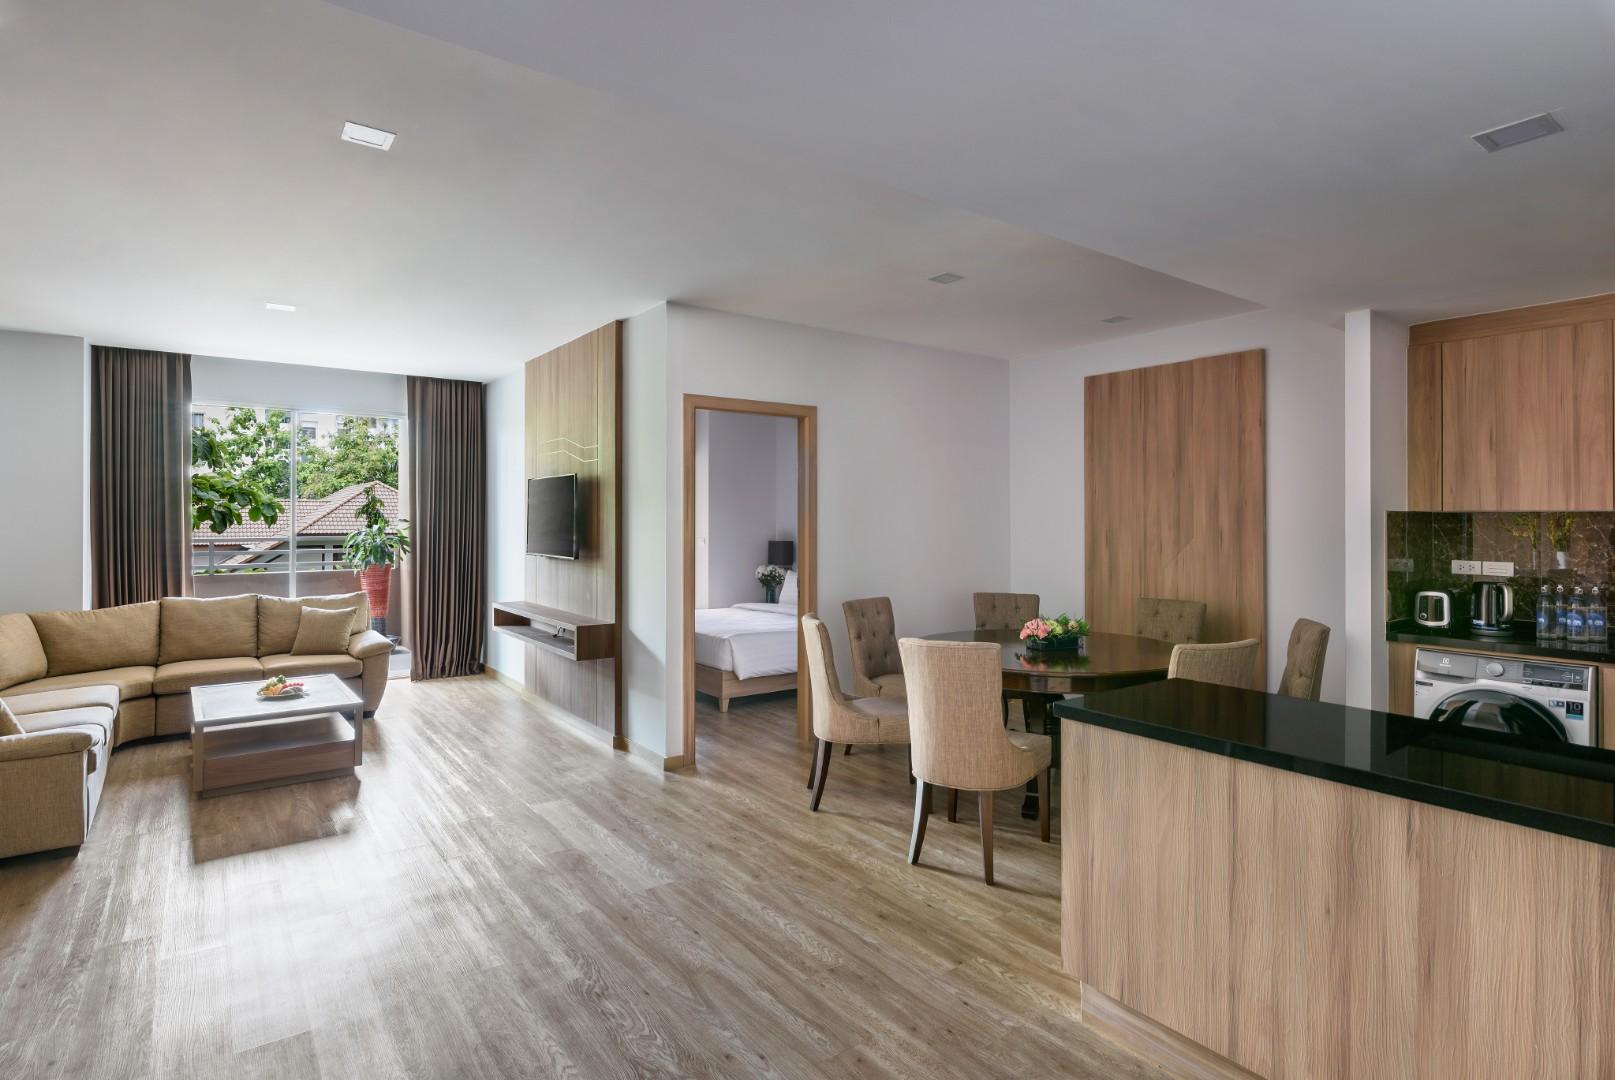 201907 Adelphi Grande Sukhumvit Hotel - Room 401 Living Area and Dining Area.jpg